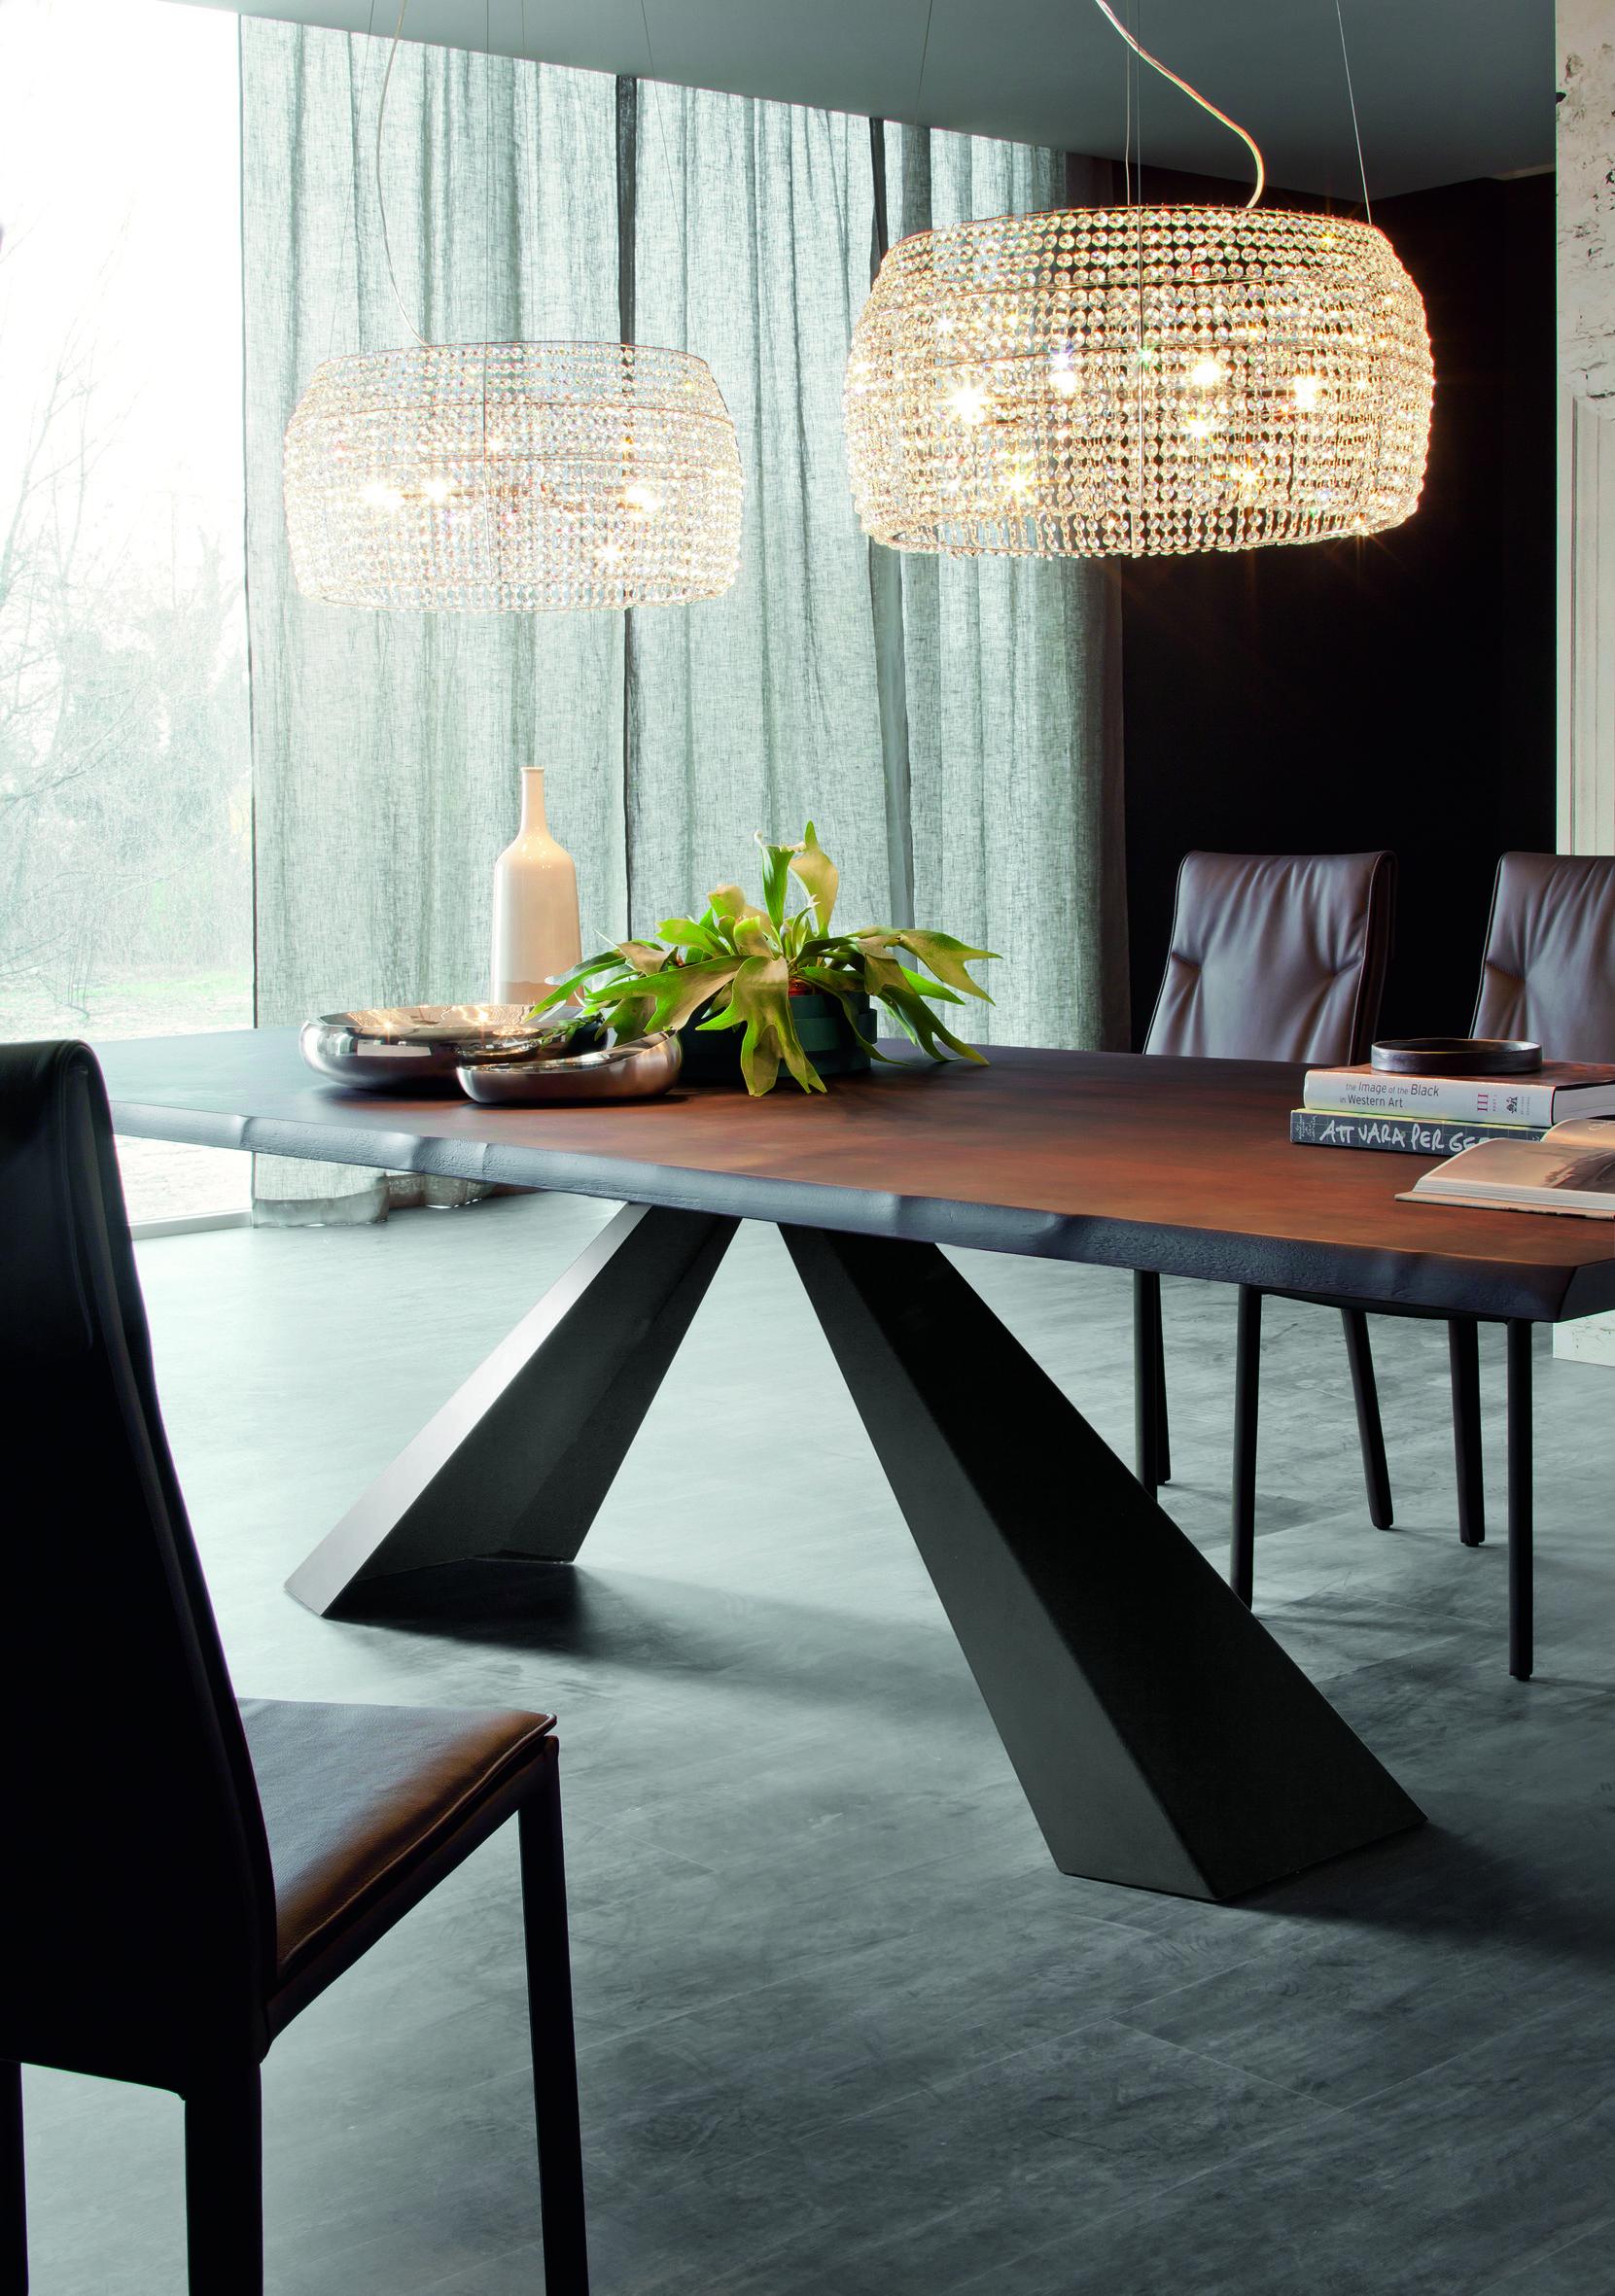 cattelan italia esstisch eliot wood cattelan italia tische. Black Bedroom Furniture Sets. Home Design Ideas